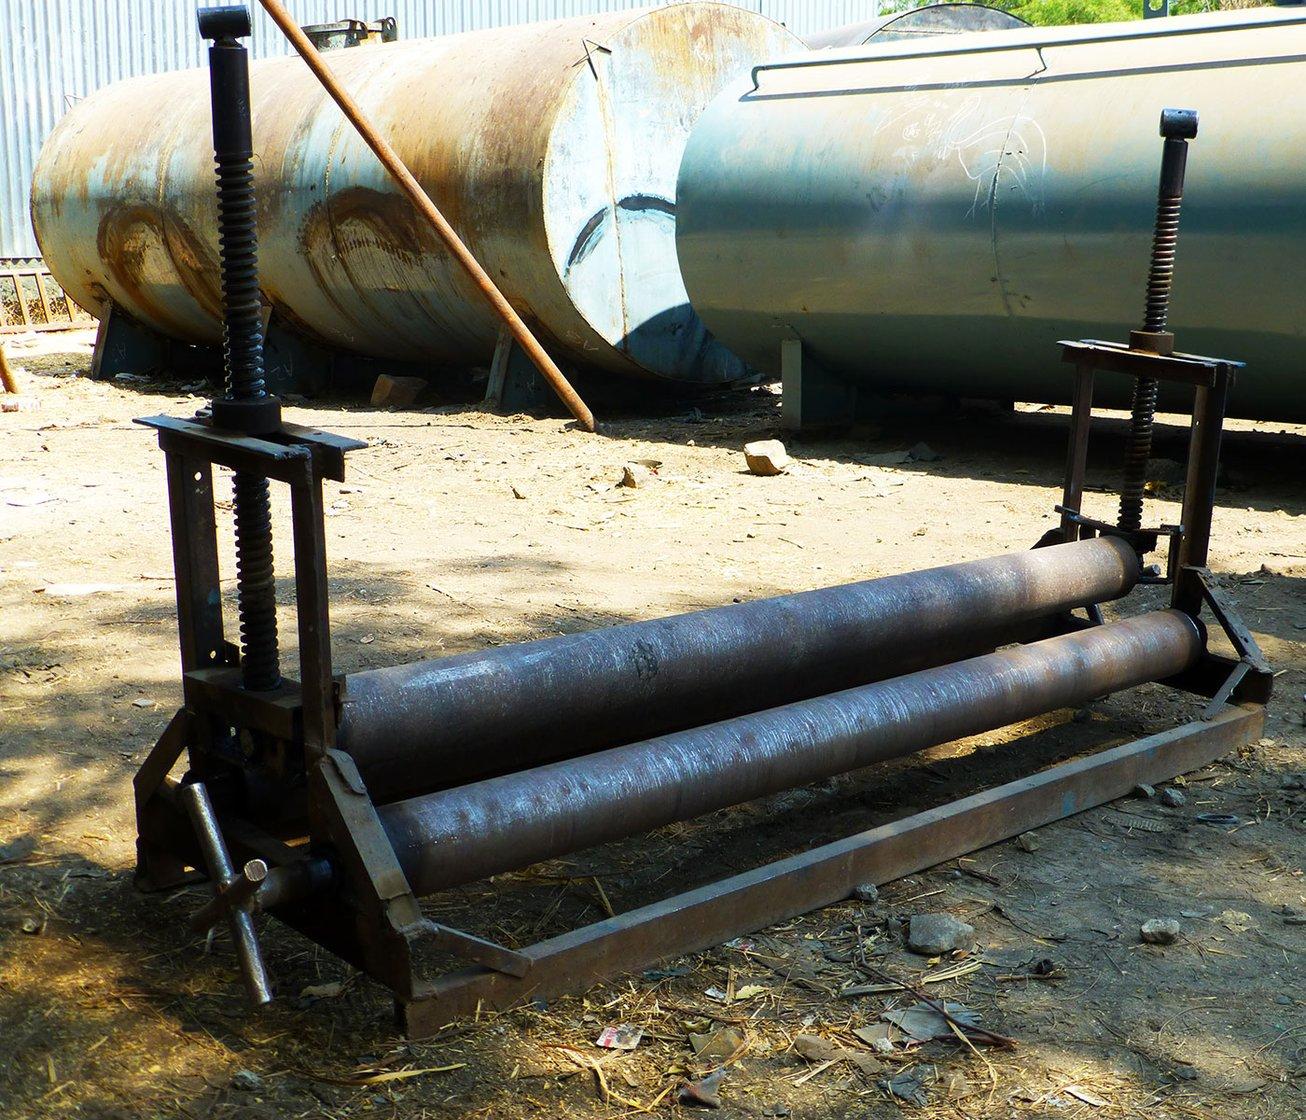 02-Melawane-rolling-machine-Rahuri-P1010546(Crop)-PS-Tankers and the Economy of Thirst.jpg